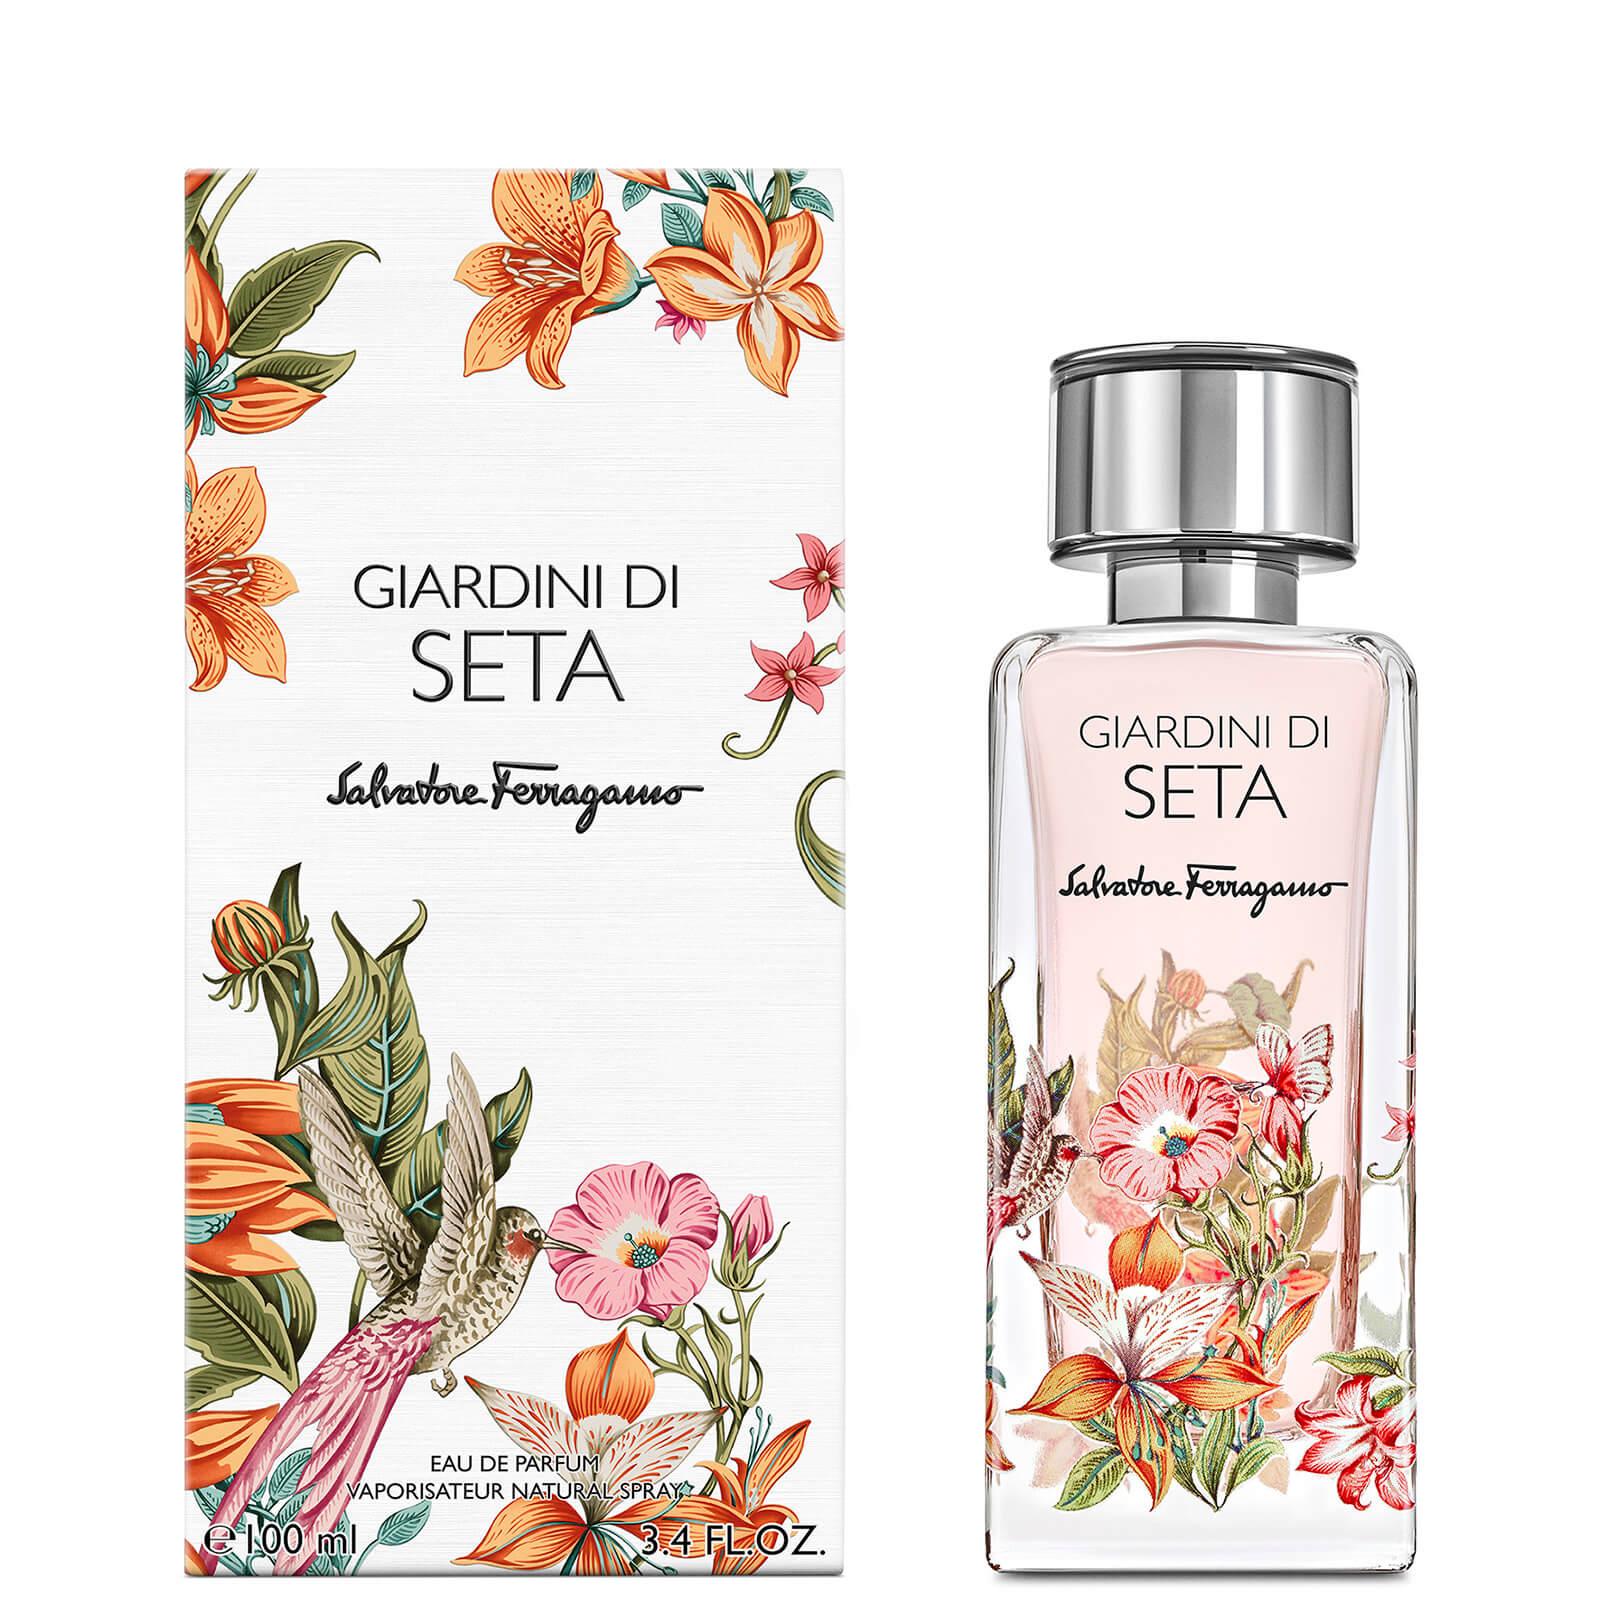 Image of Eau de Parfum Storie Giardini Di Seta Salvatore Ferragamo 100ml